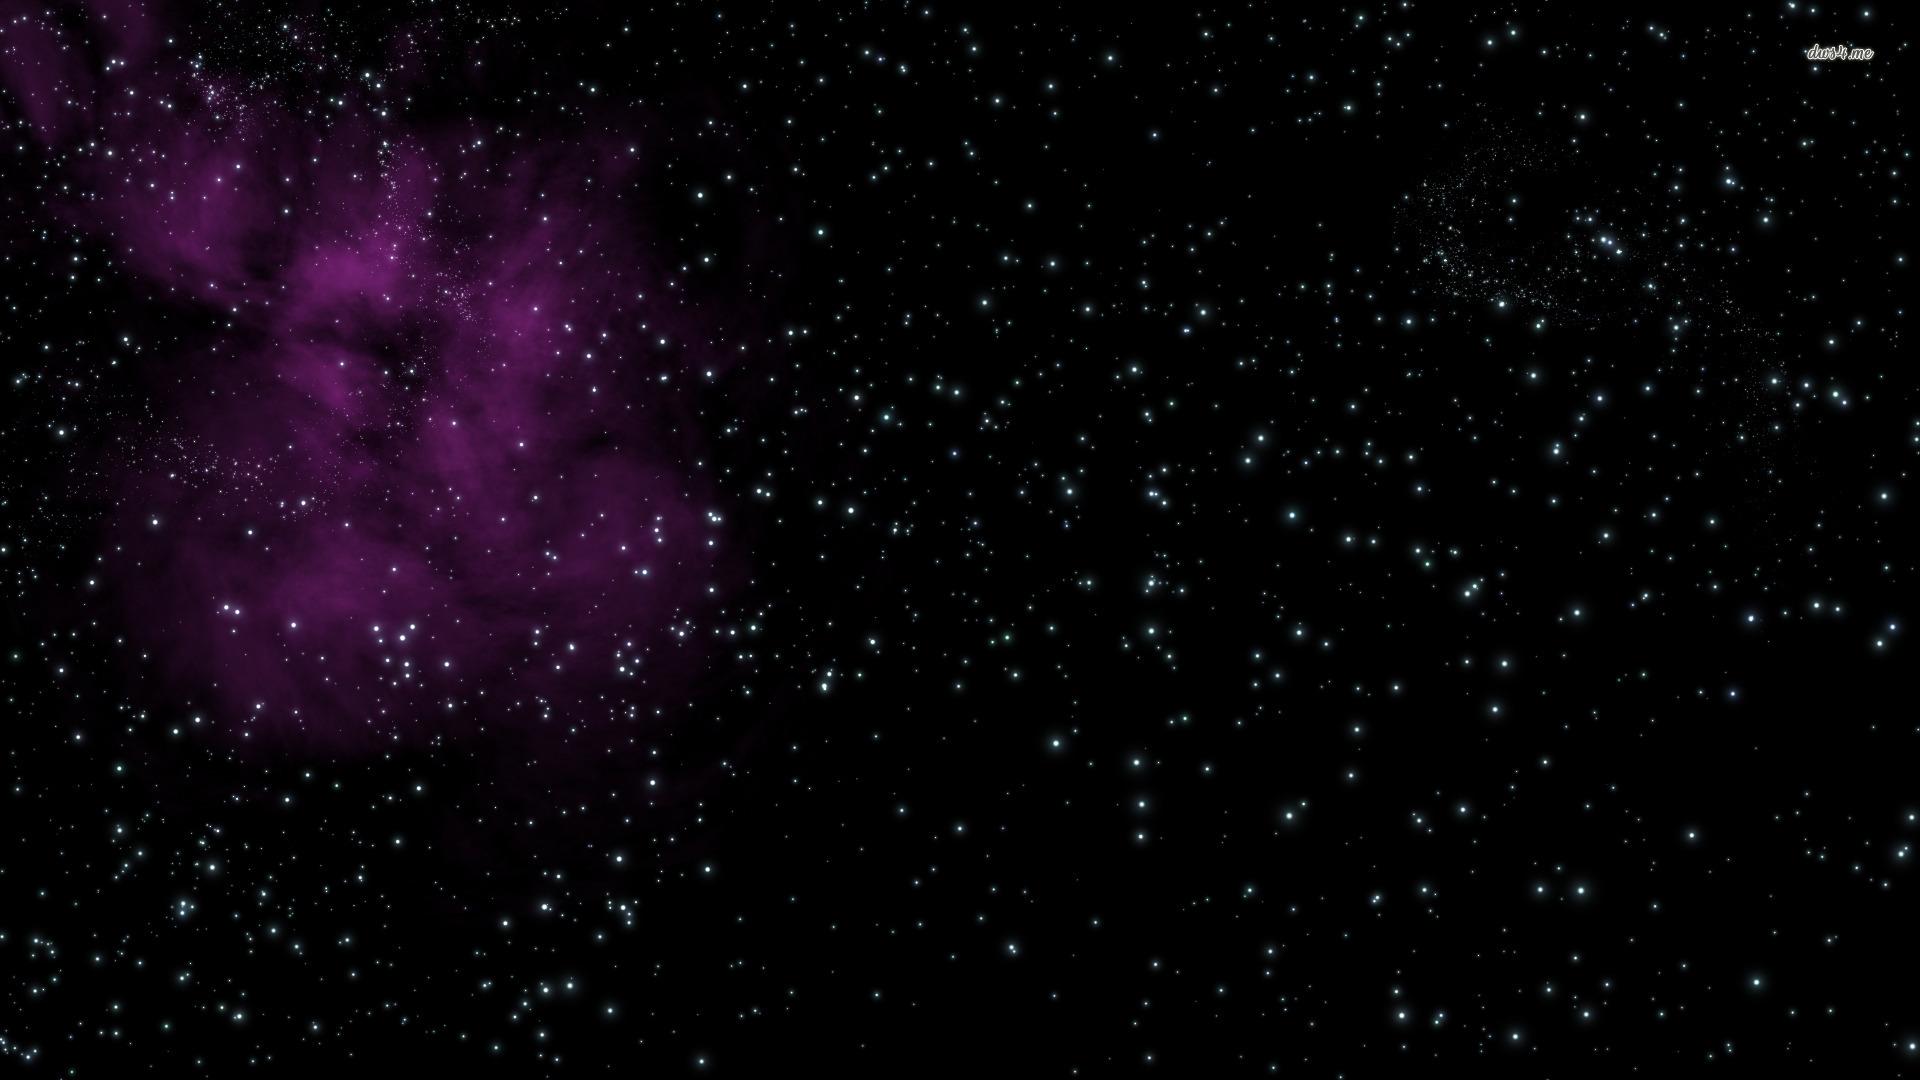 Night Sky wallpapers HD   259635 1920x1080